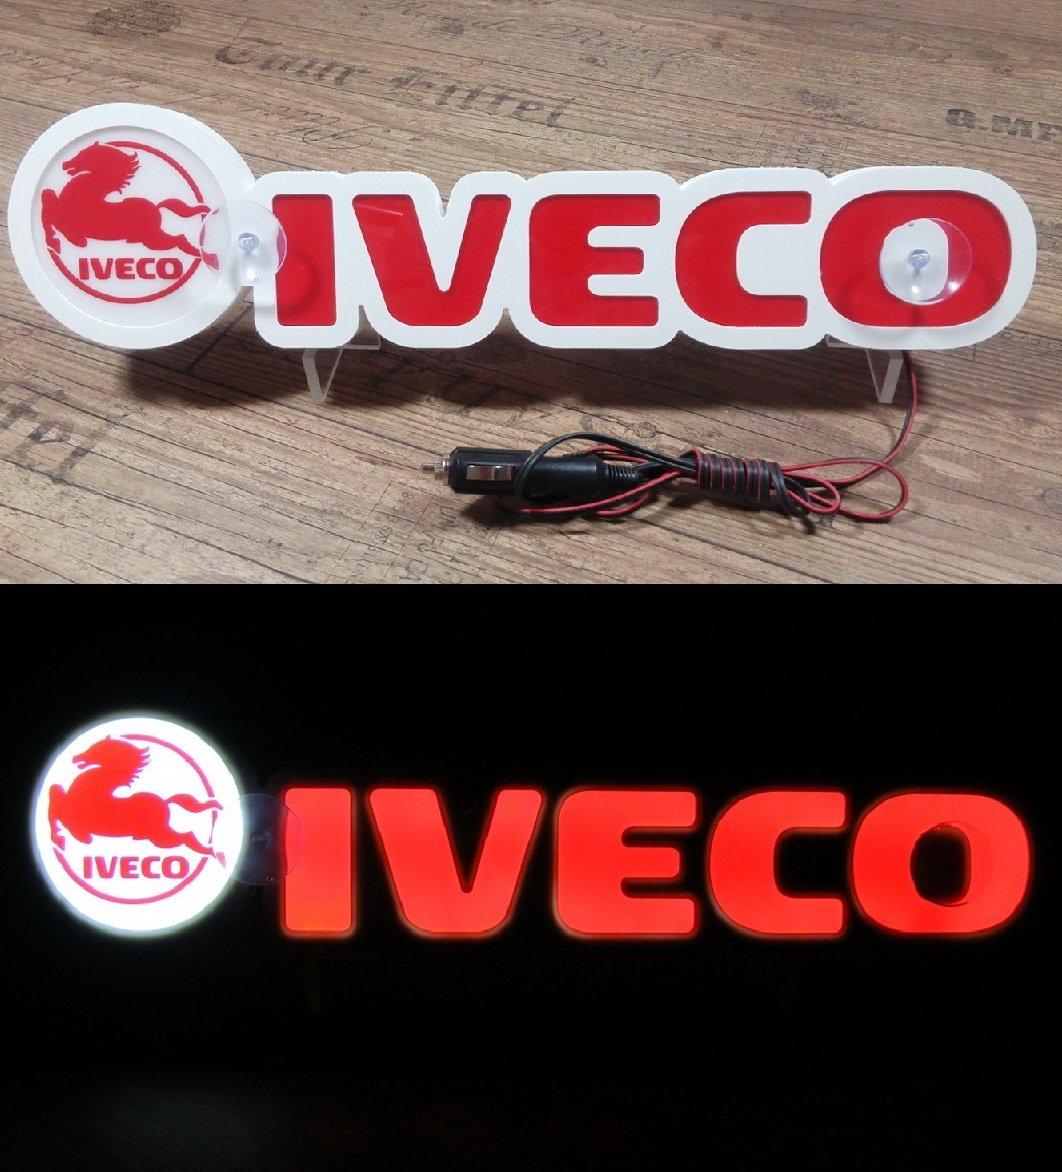 3D 24 V LED luce neon piastra trucker Truck Red logo Sign Table illuminante solo in avanti –  doesn' t addosso durante la guida Other